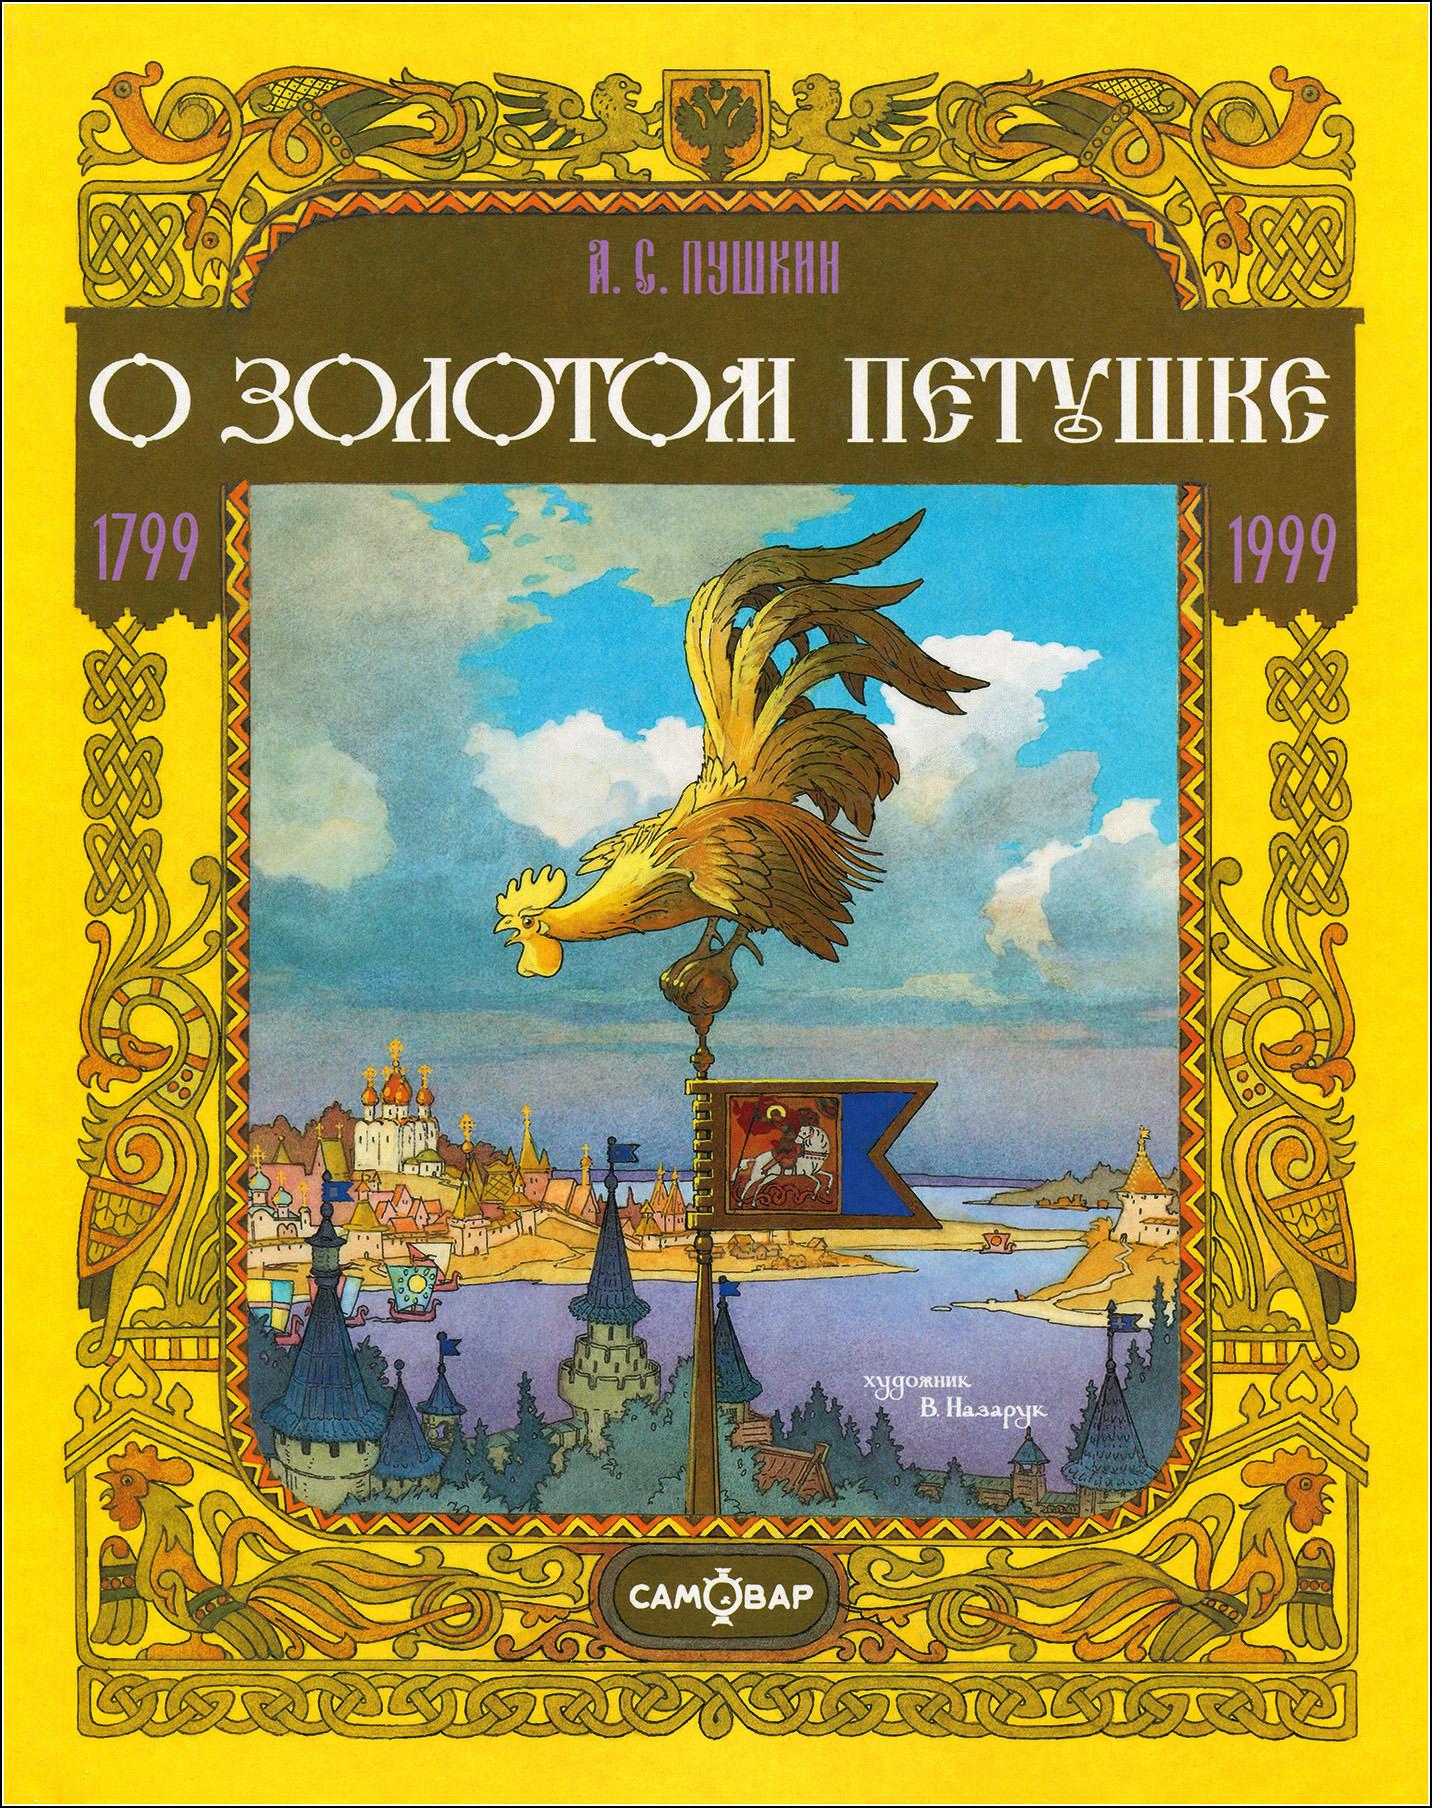 Н. Назарук, Пушкин, Сказка о золотом петушке